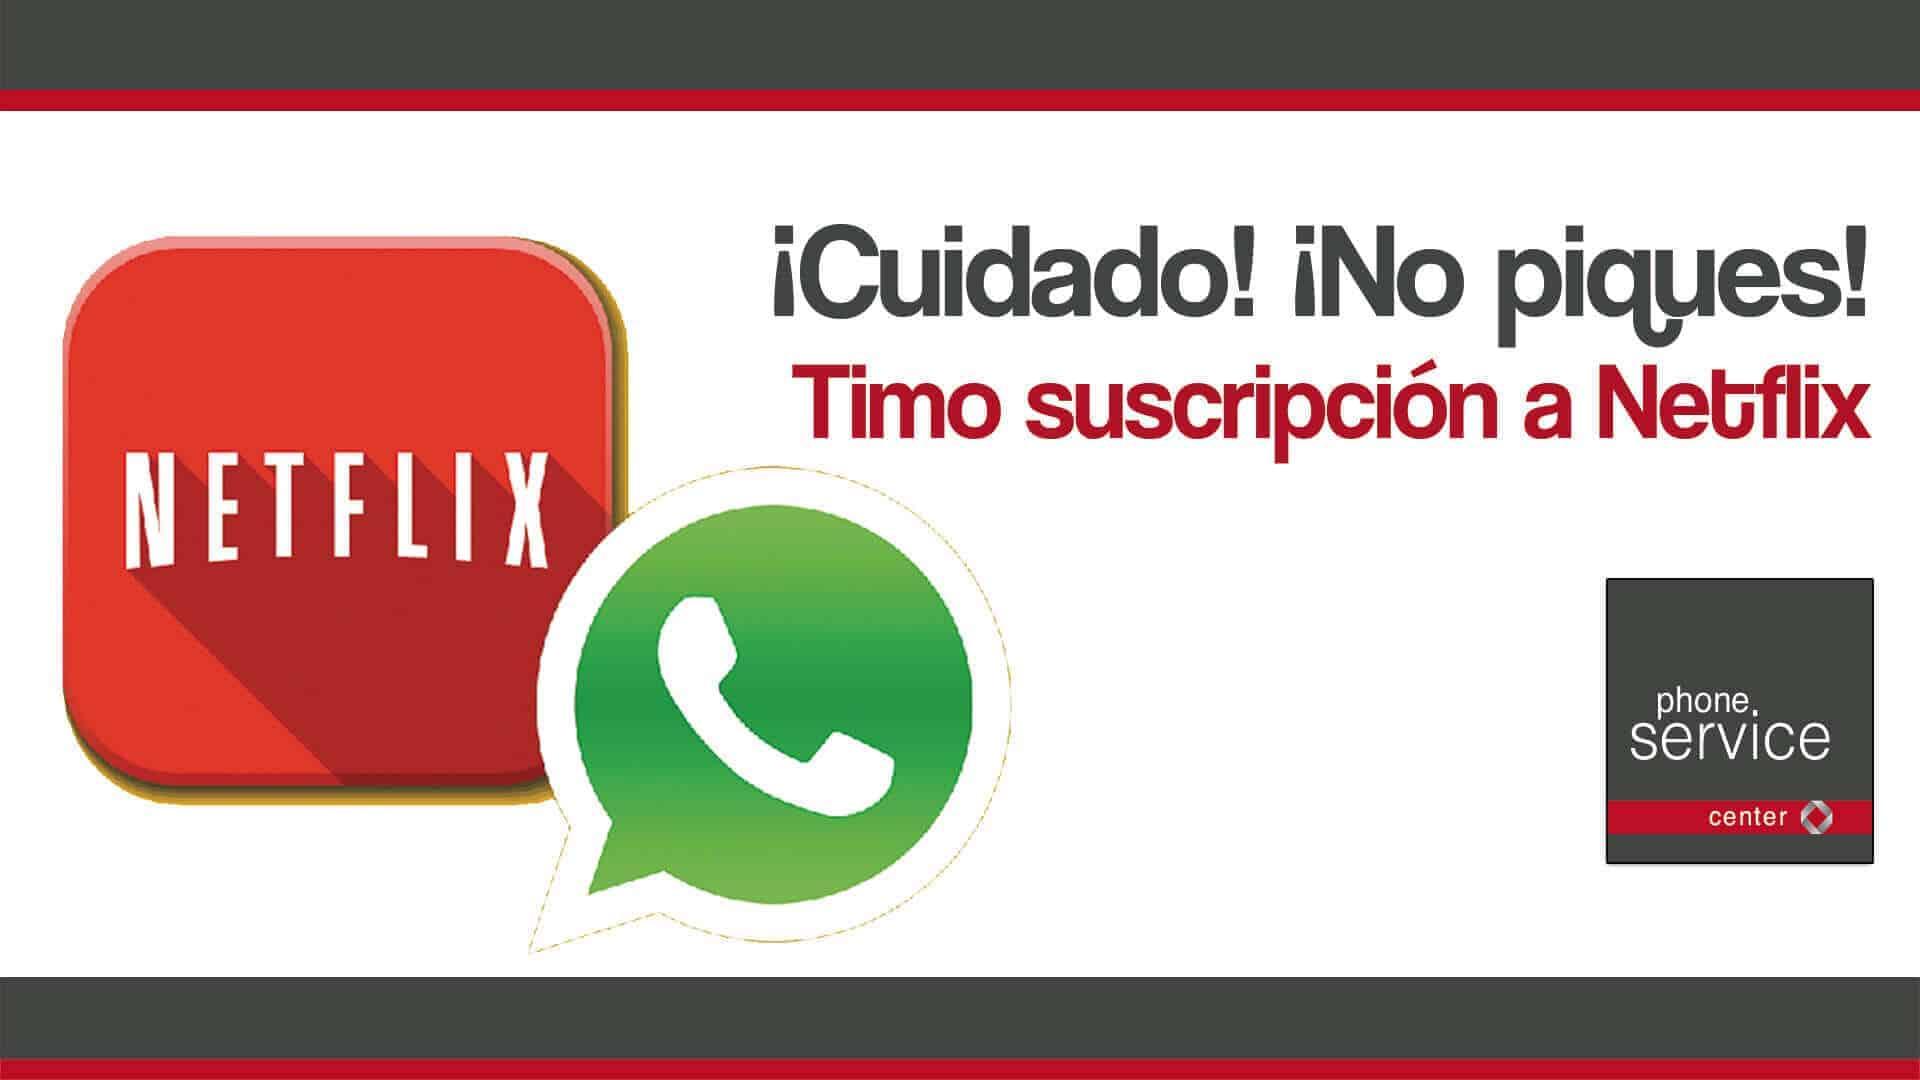 ultimo timo de whatsapp netflix